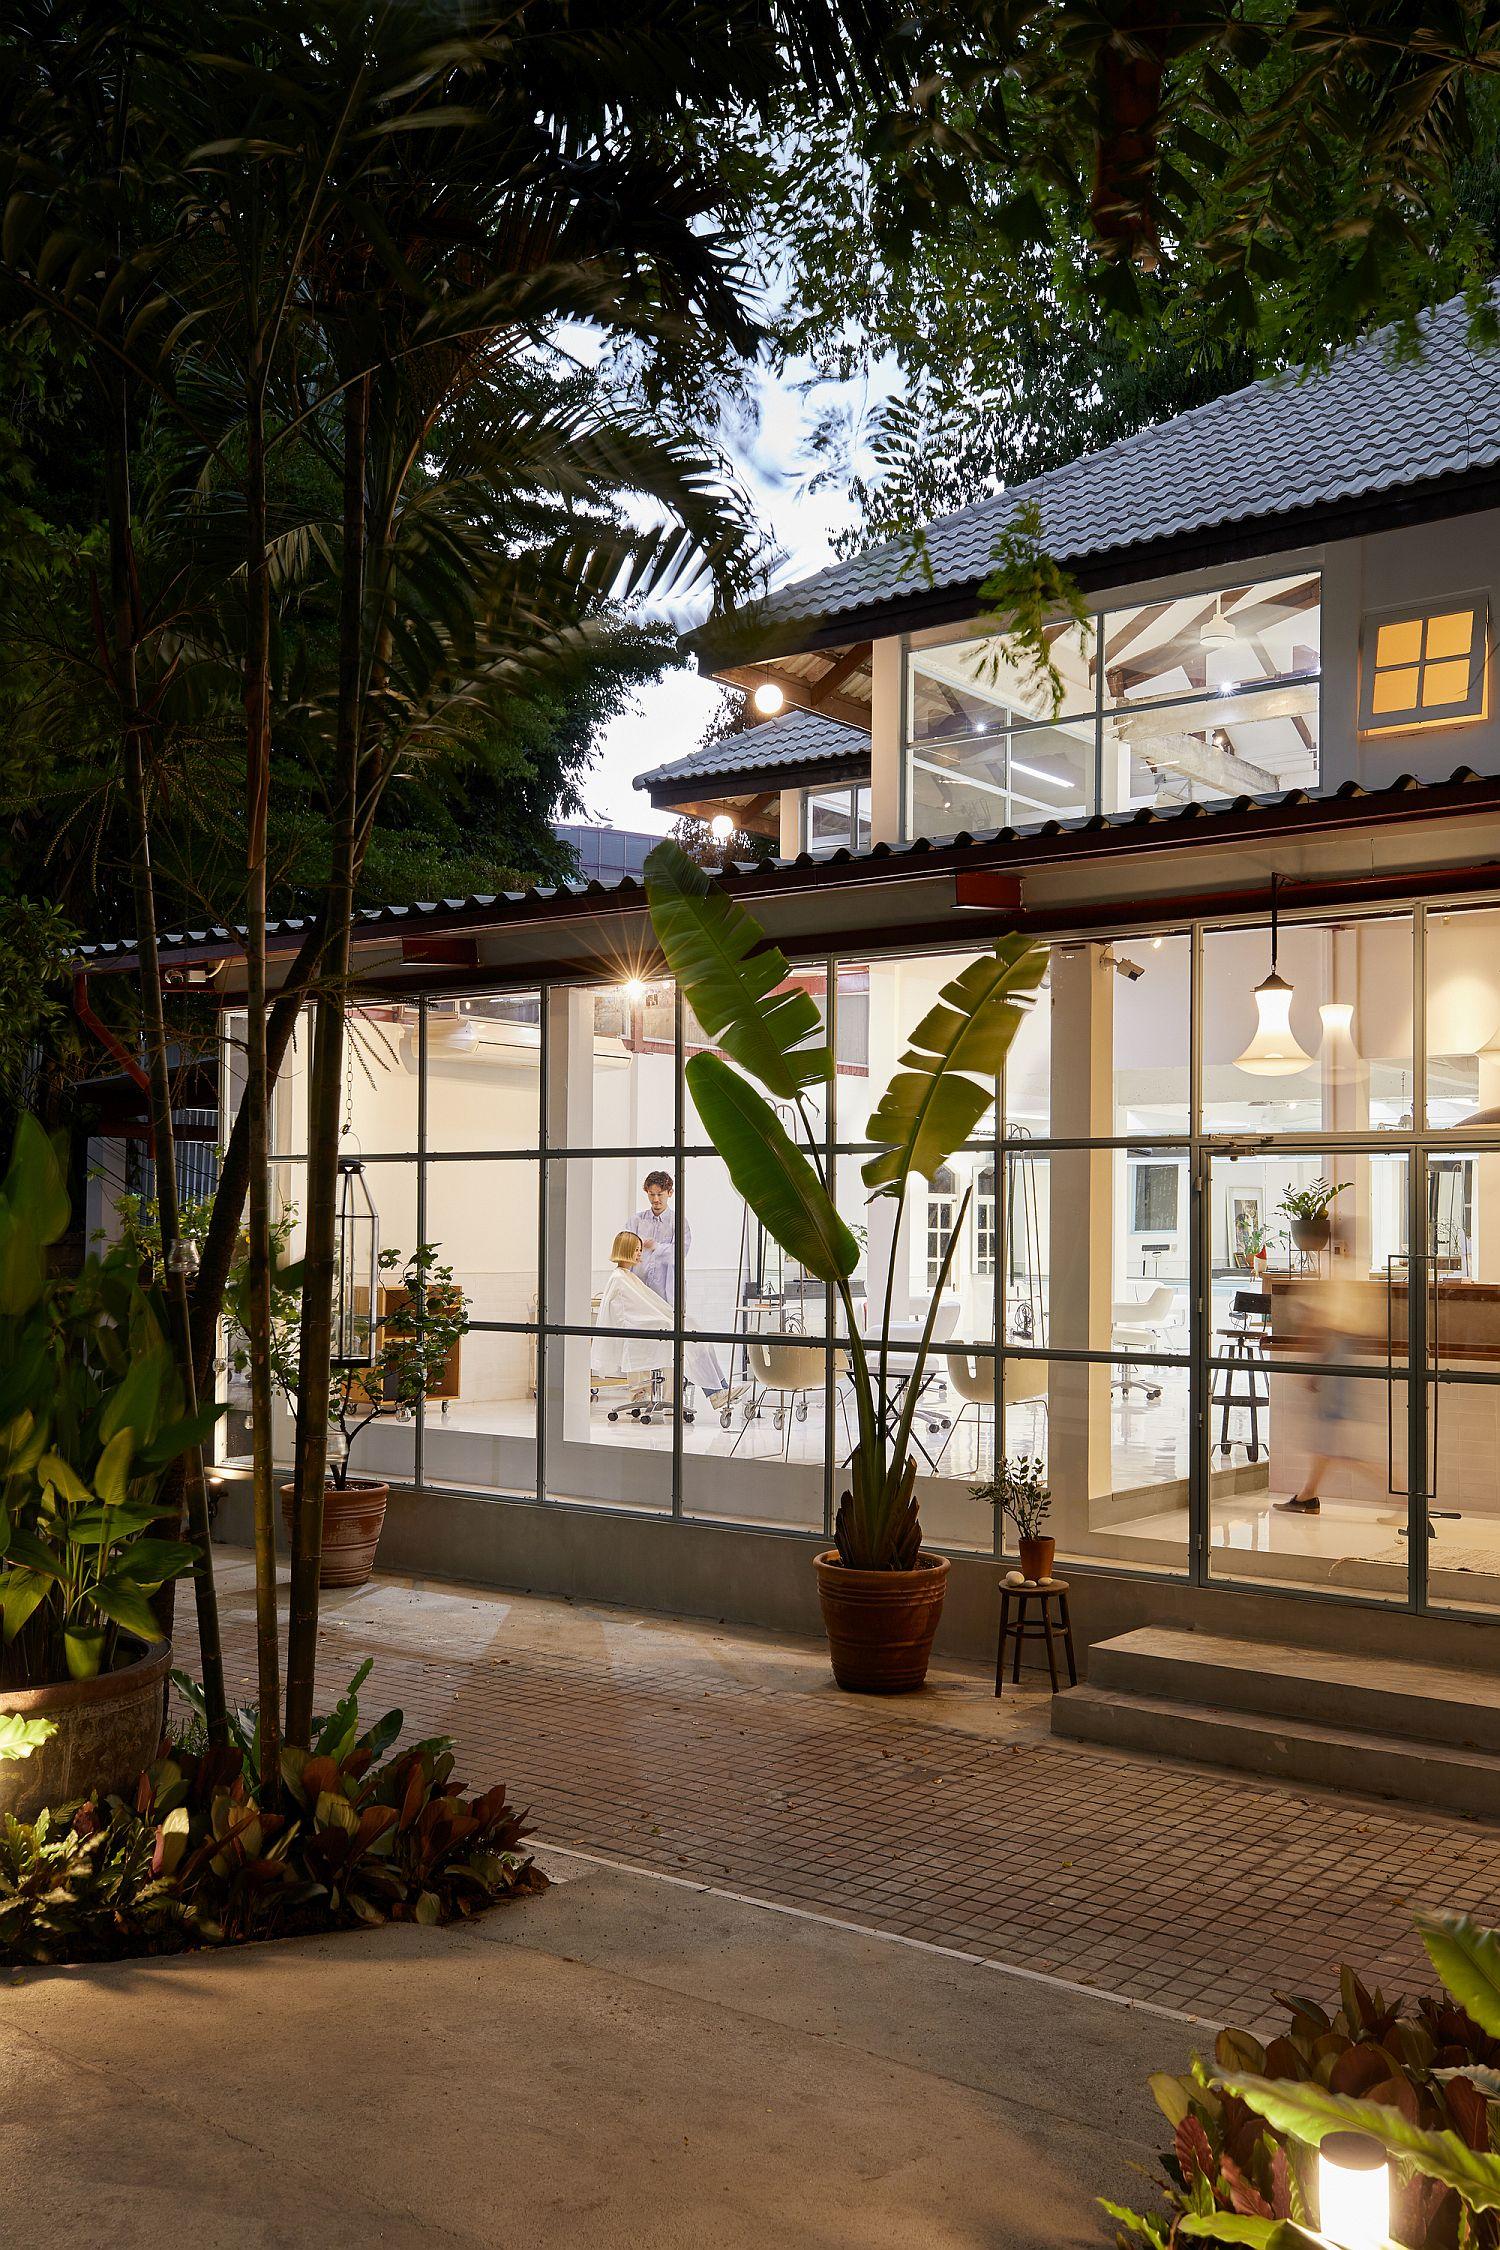 Twin level multi-generational home turned into salon